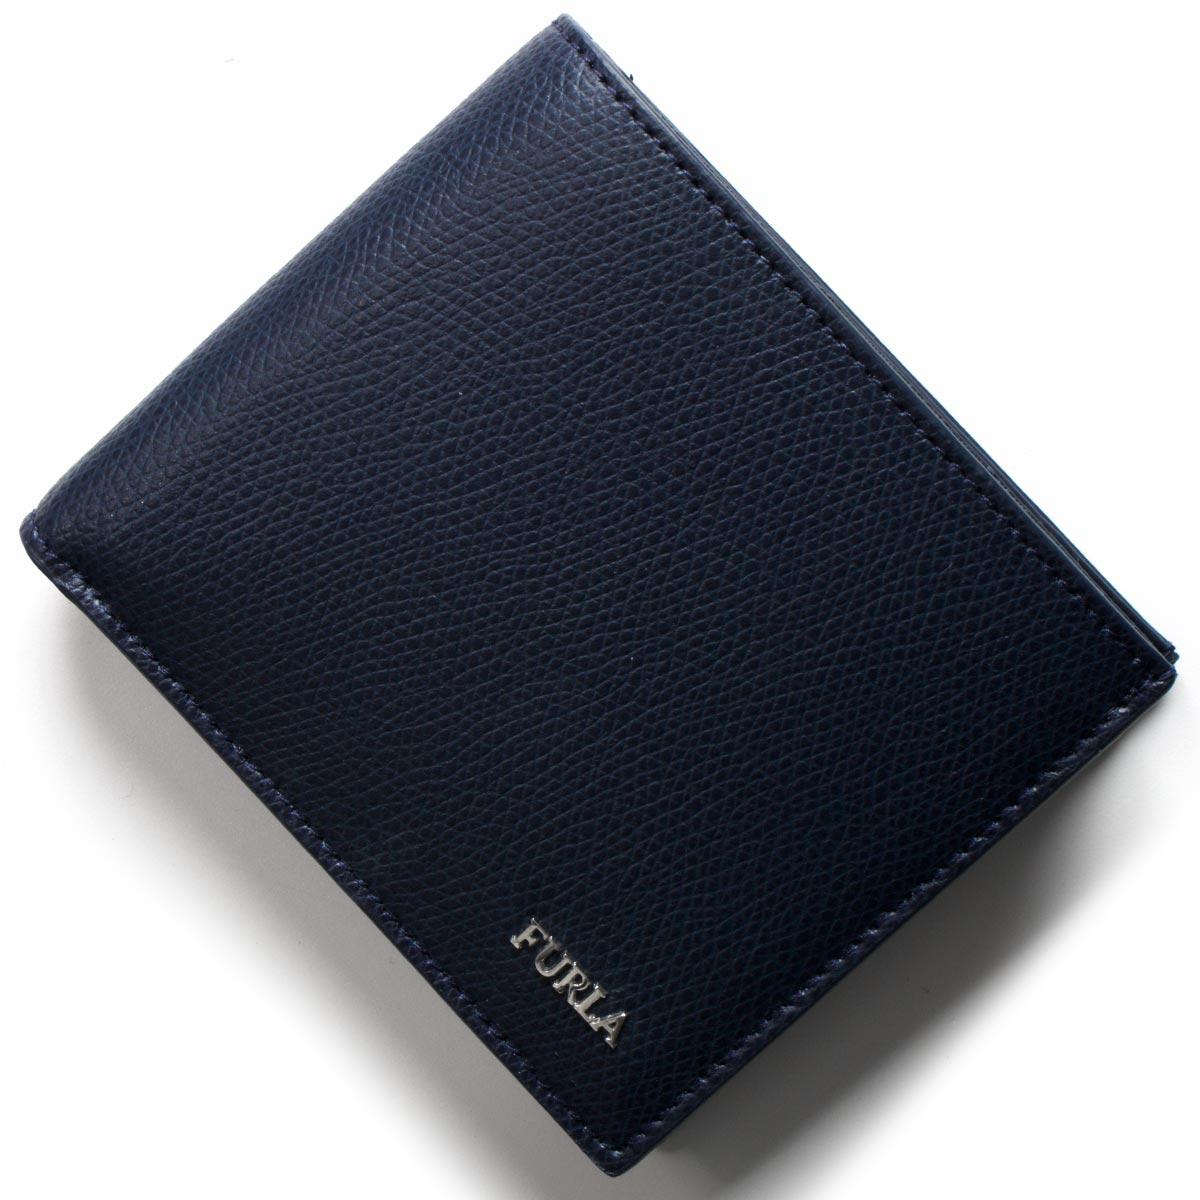 96d8f501d5ce フルラ 二つ折り財布 FURLA B1U ATT PT00 ブルー マルテ メンズ 財布 ...